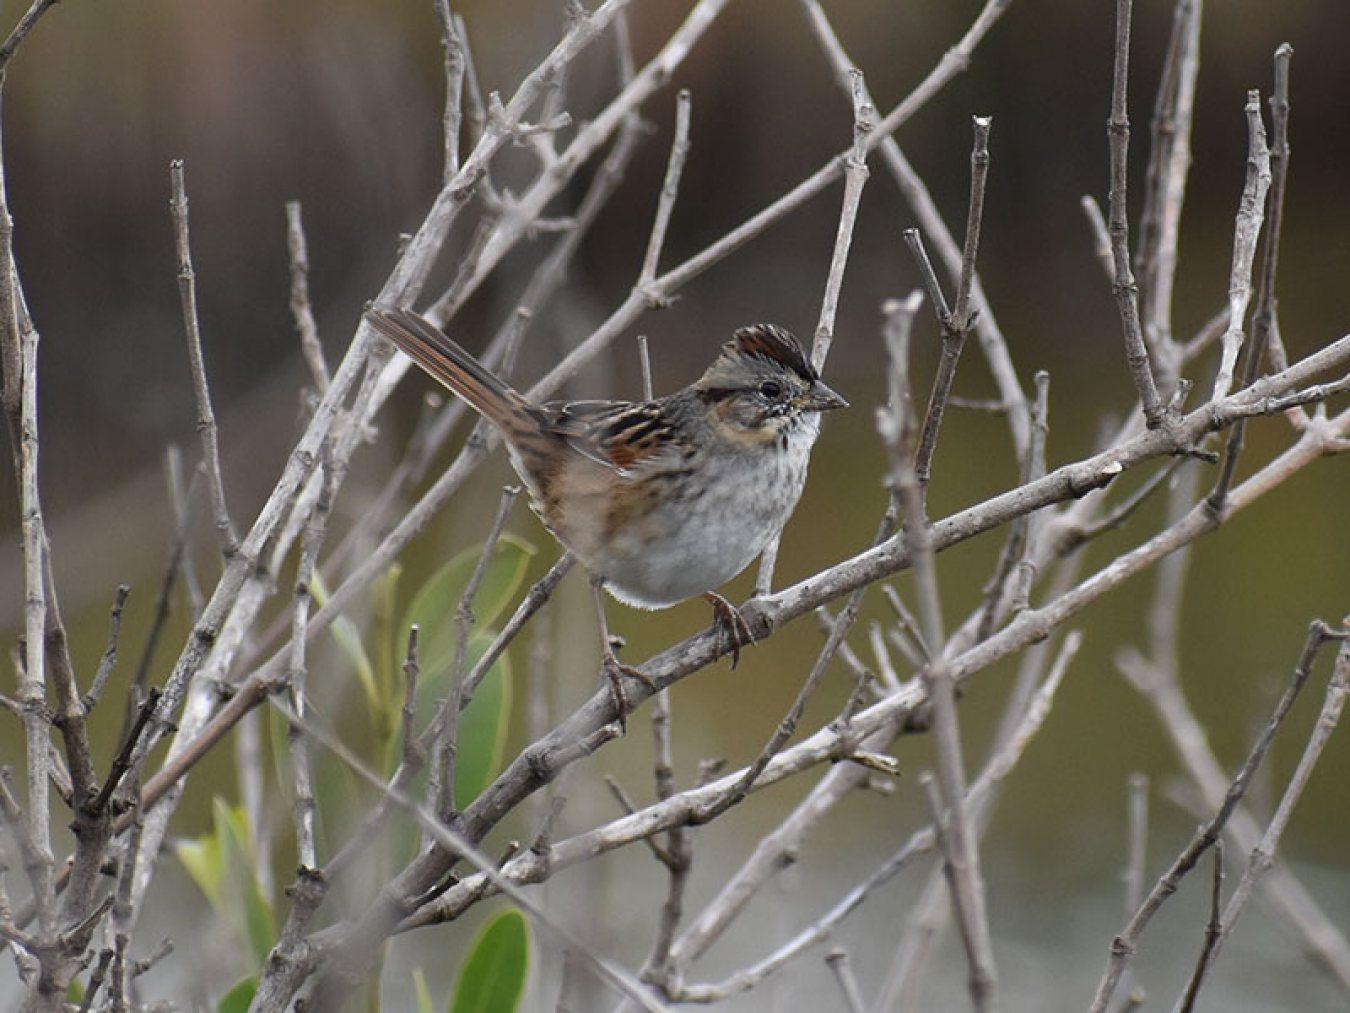 Swamp Sparrow by Mary Halligan